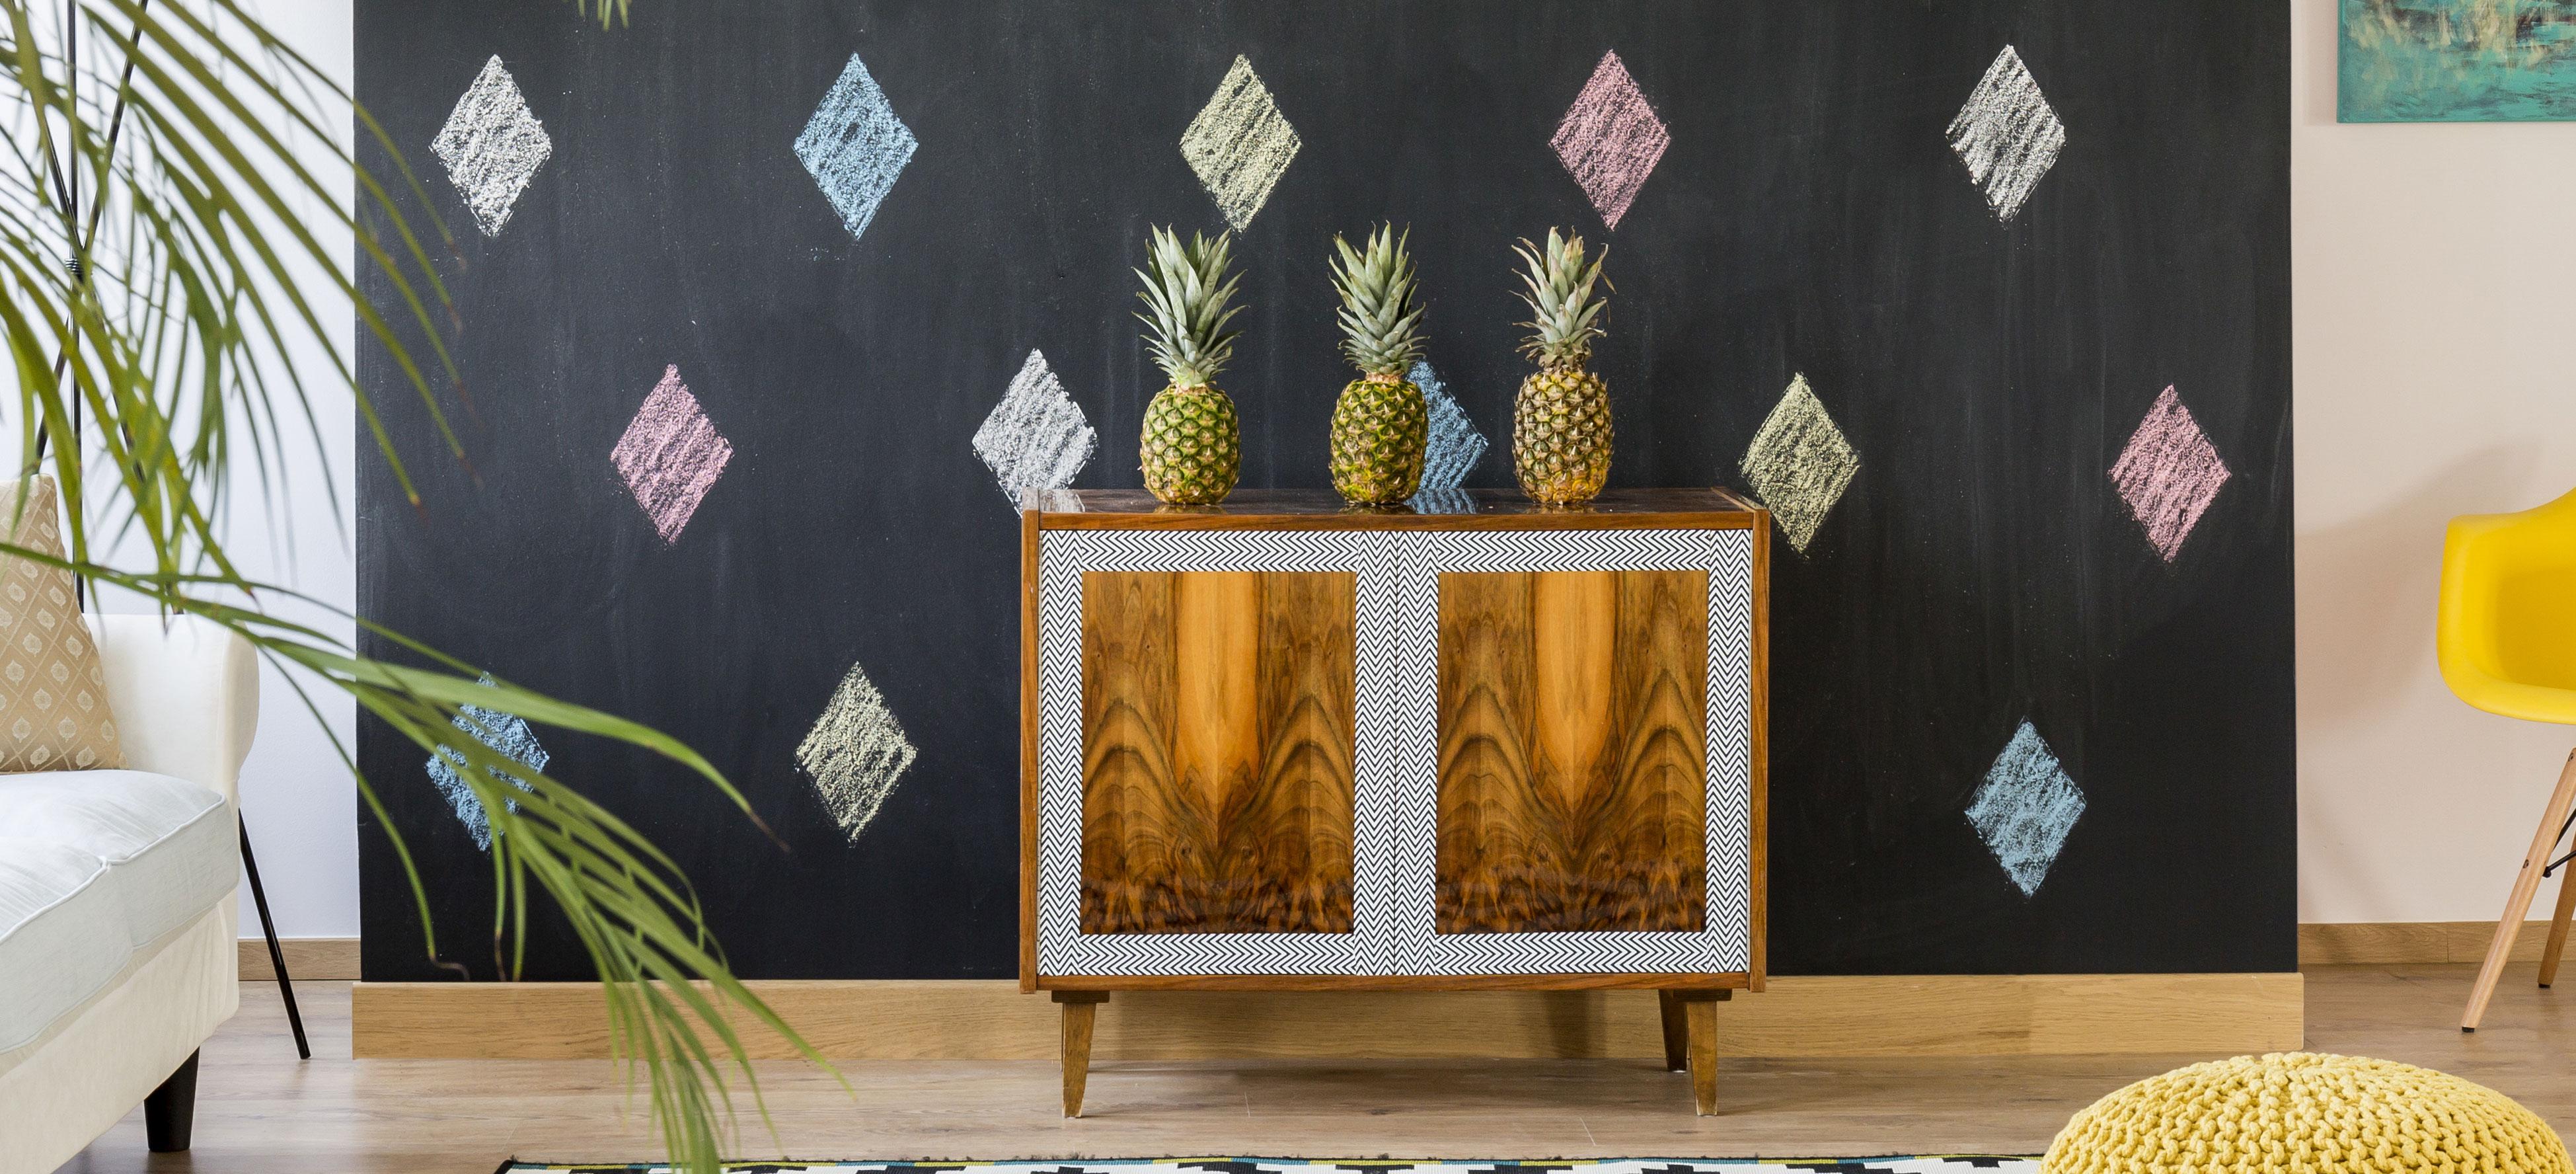 parete-decorata-con-vernice-lavagna